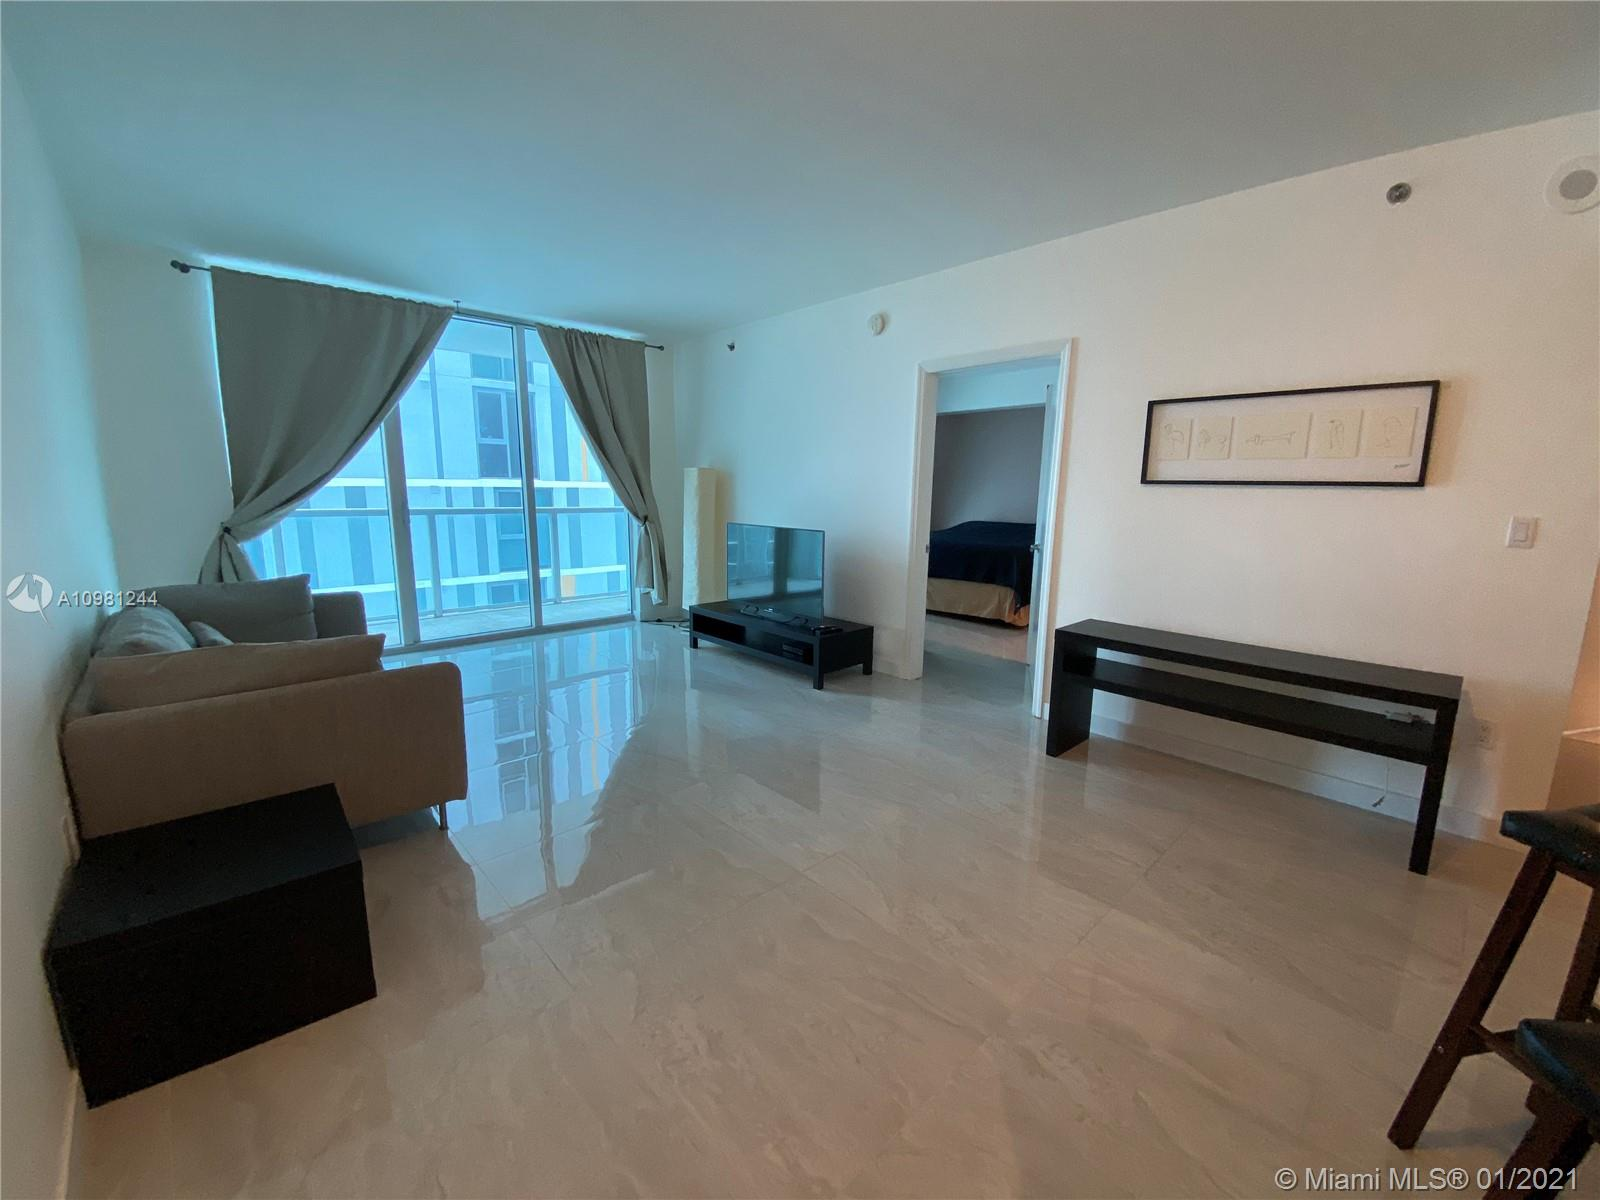 500 Brickell East Tower #1700 - 55 SE 6th St #1700, Miami, FL 33131